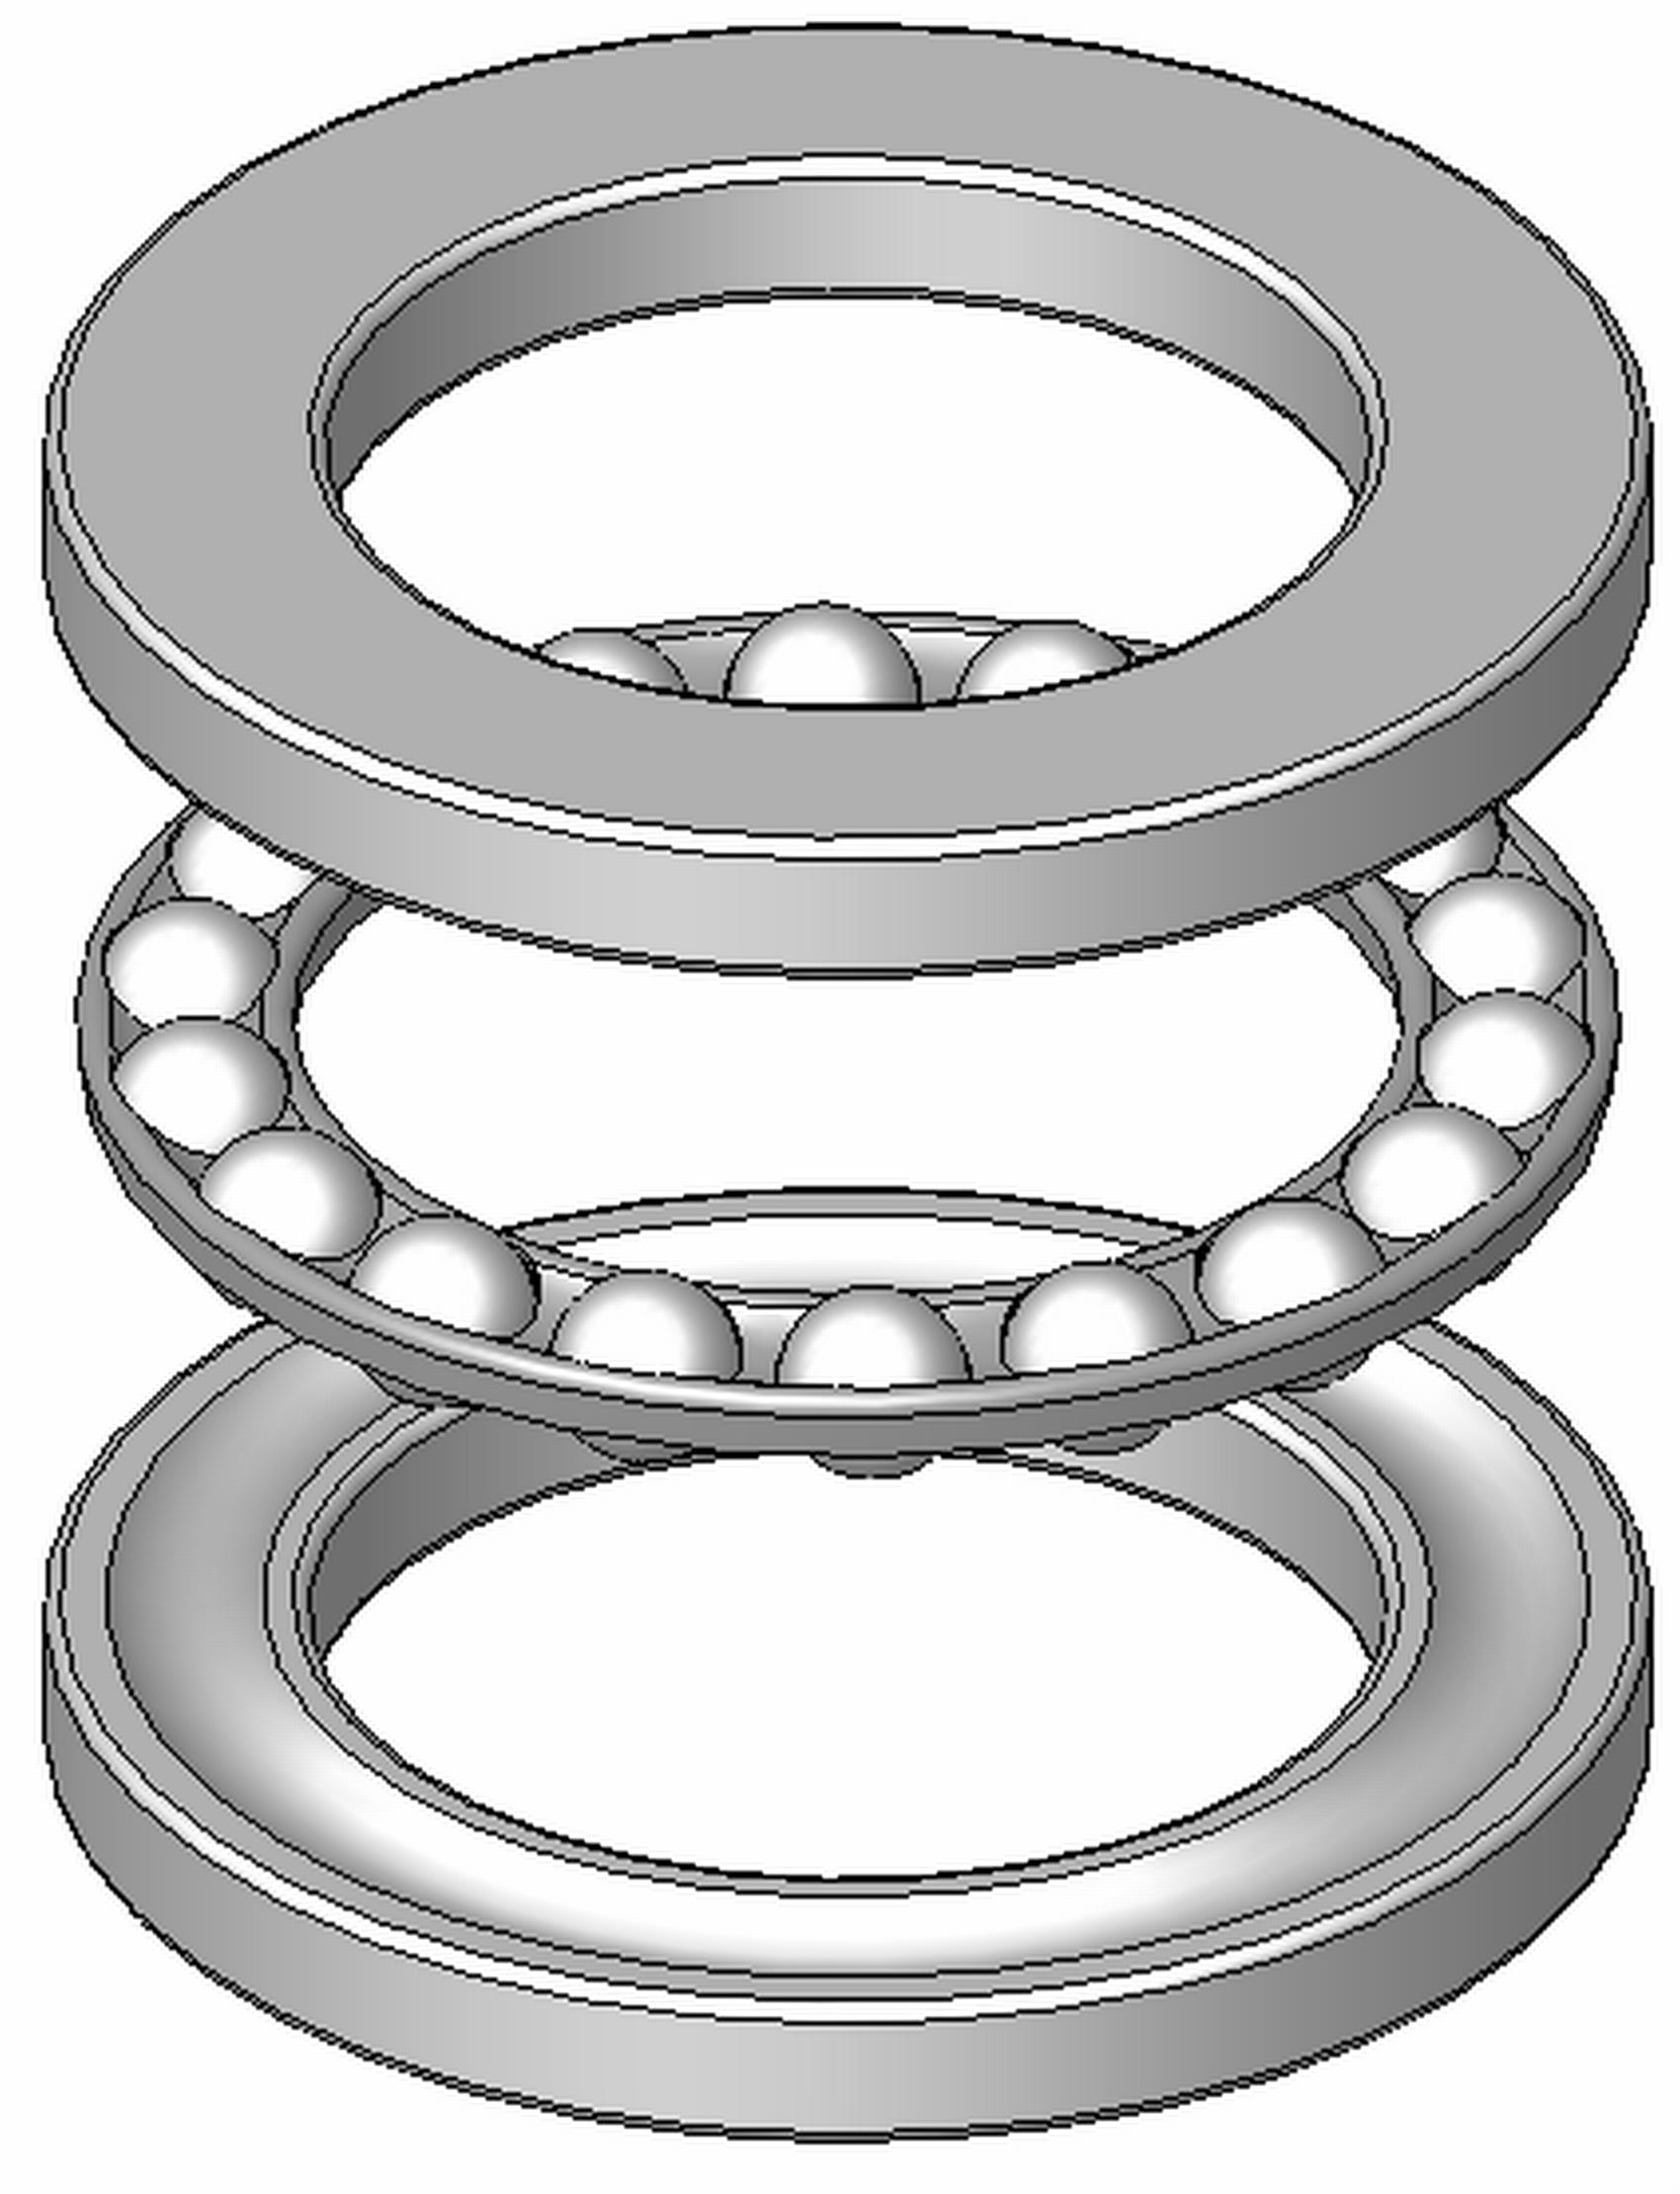 Thrust bearing - Wikipedia